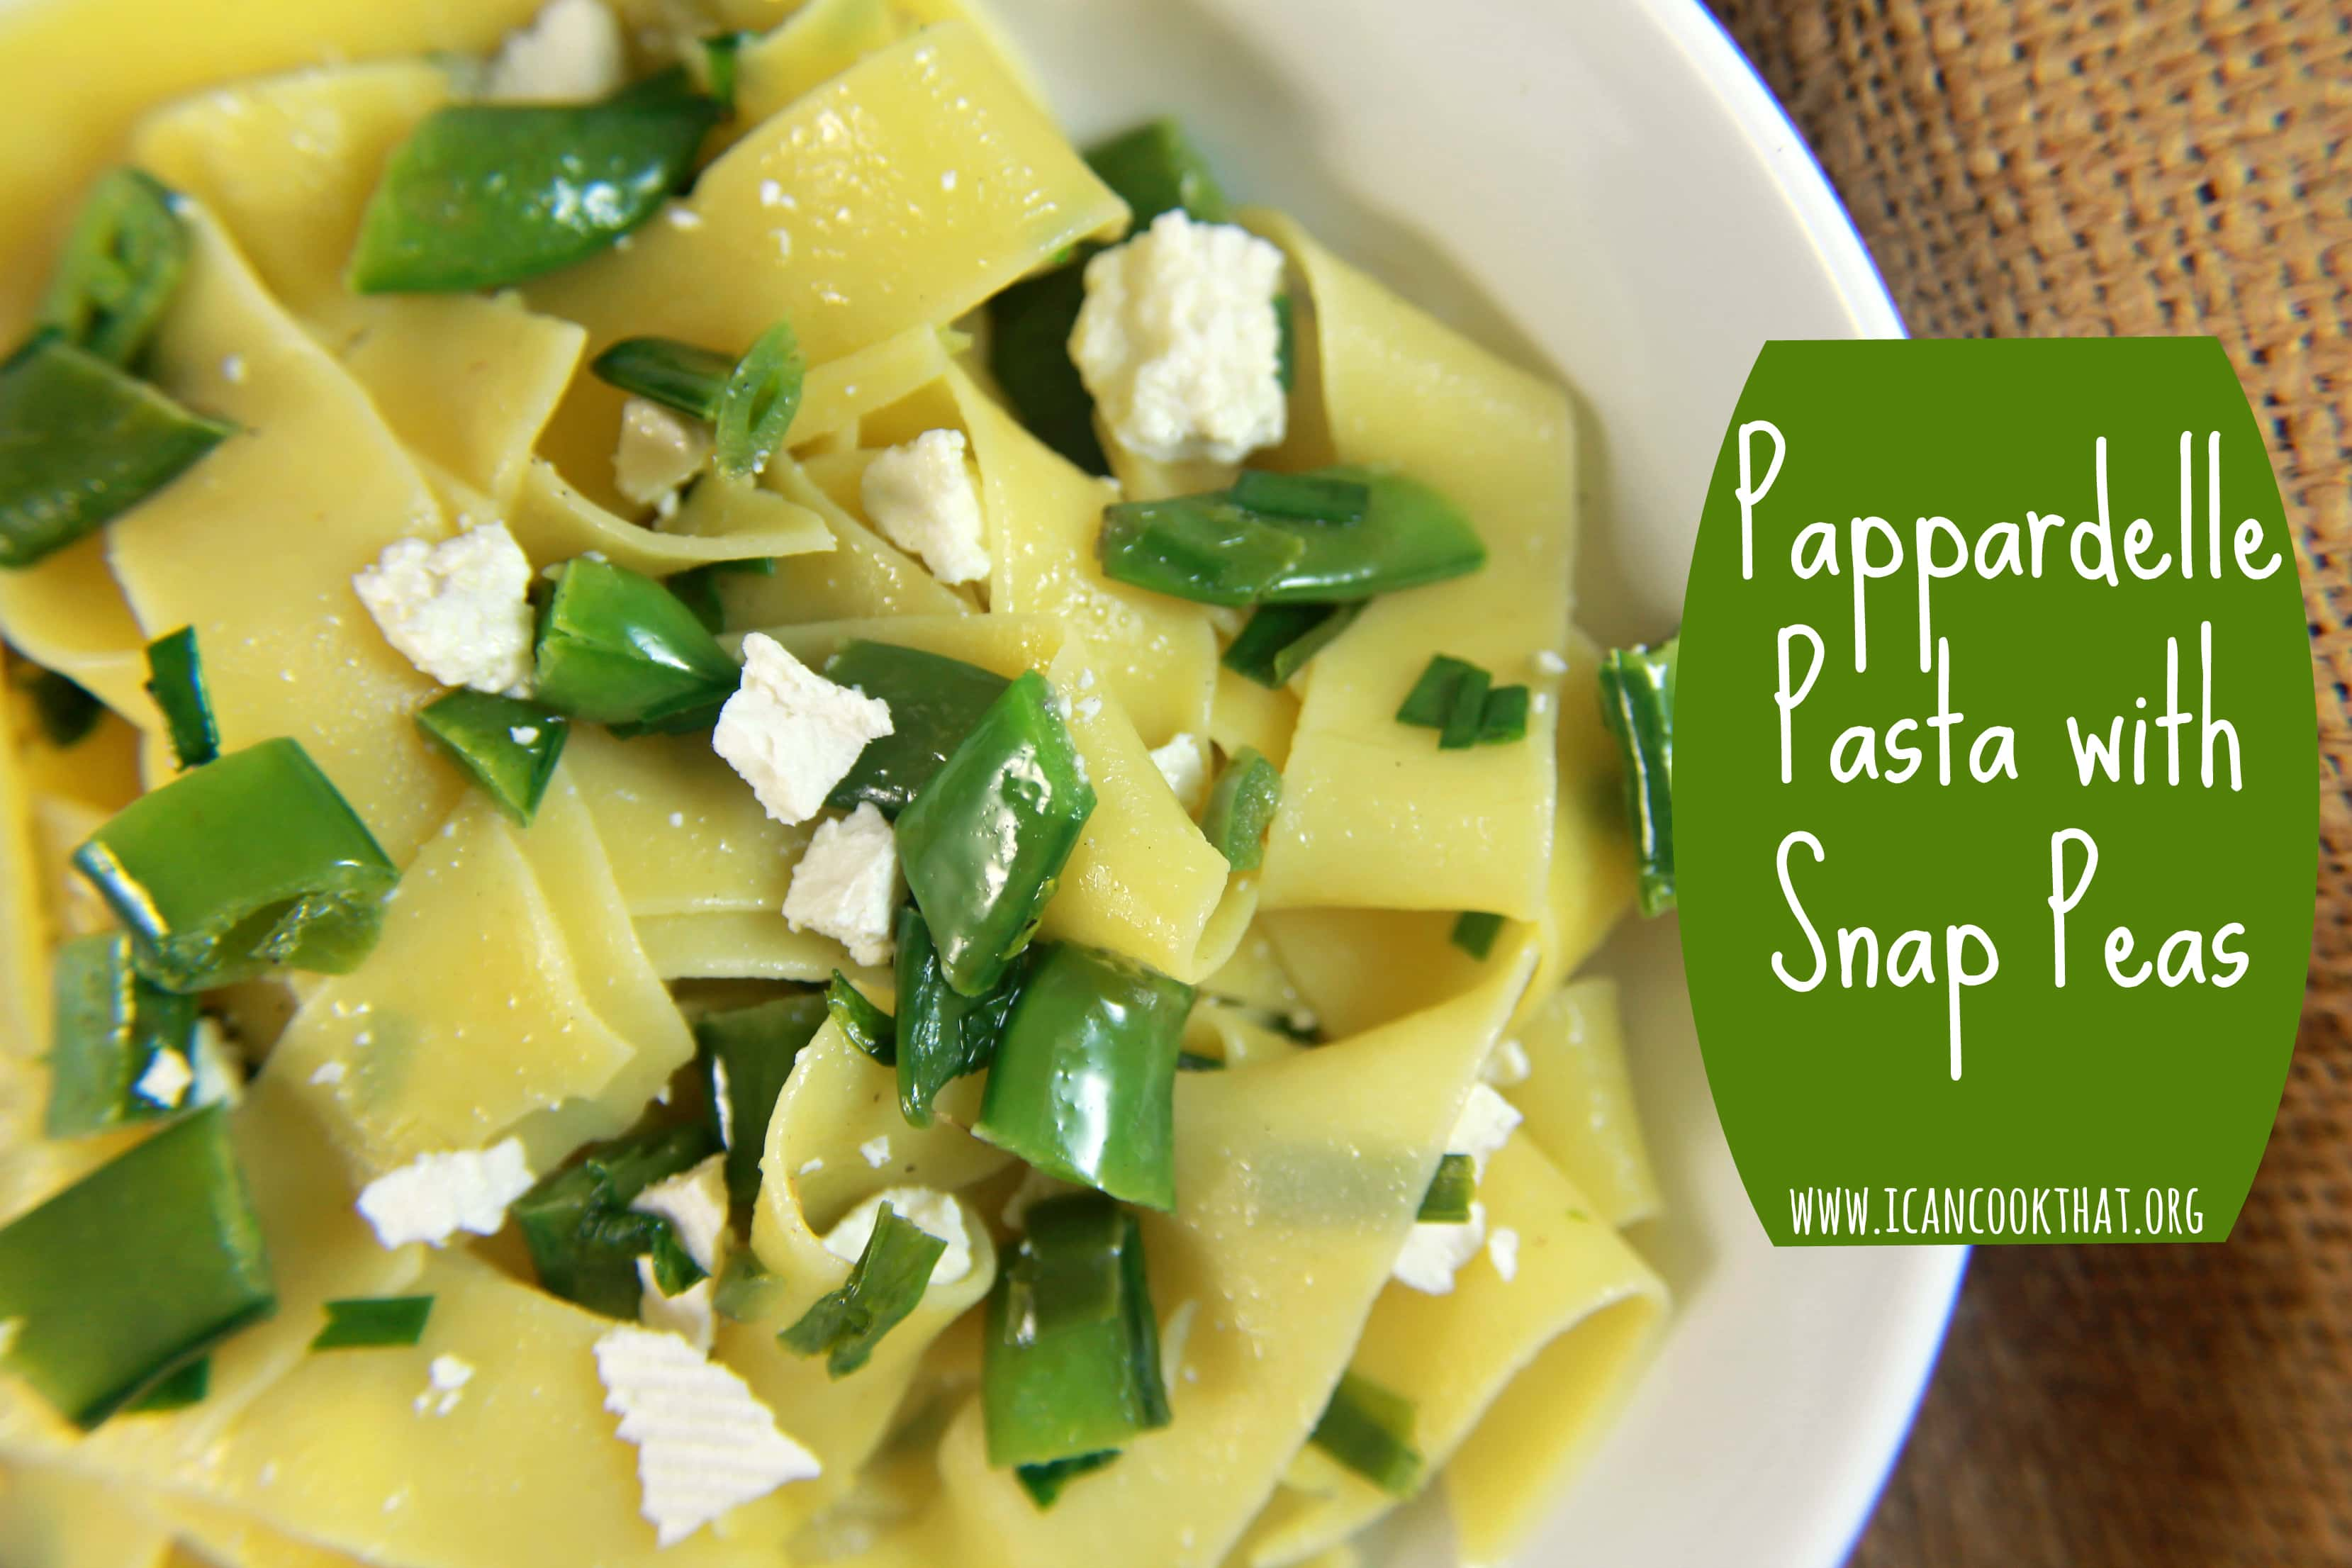 Pasta with snap peas recipes